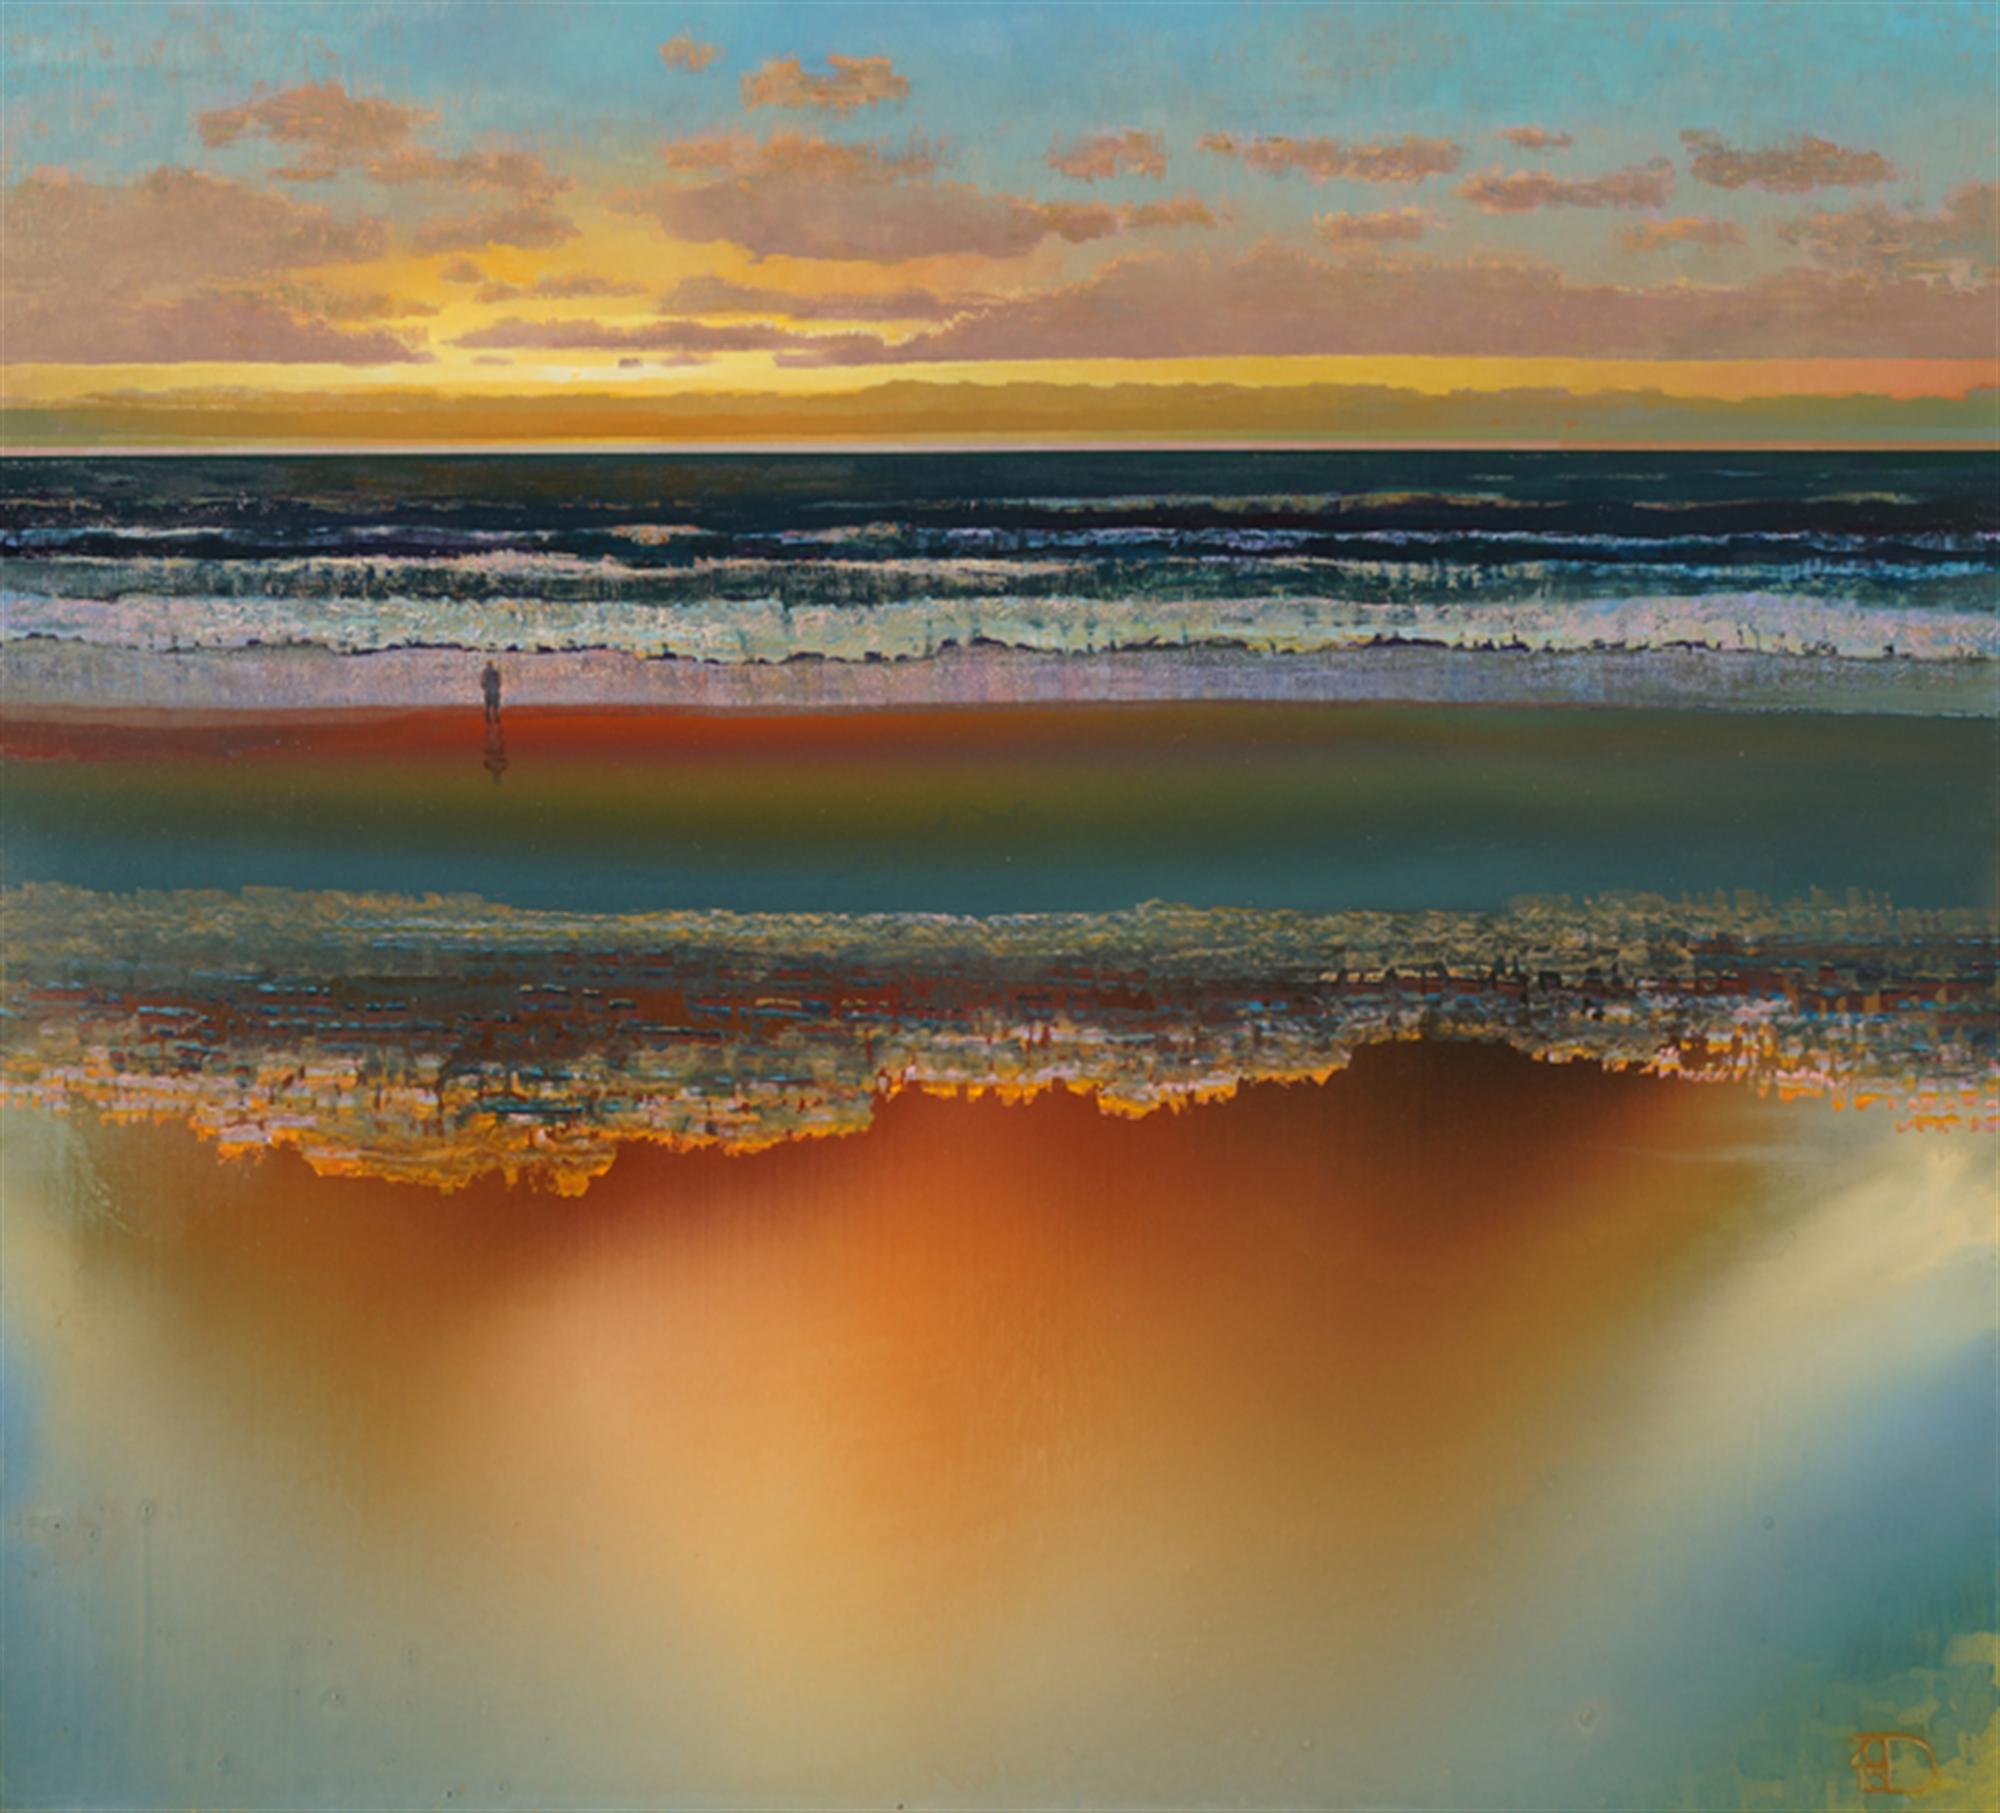 Sunset Memories by Ton Dubbeldam